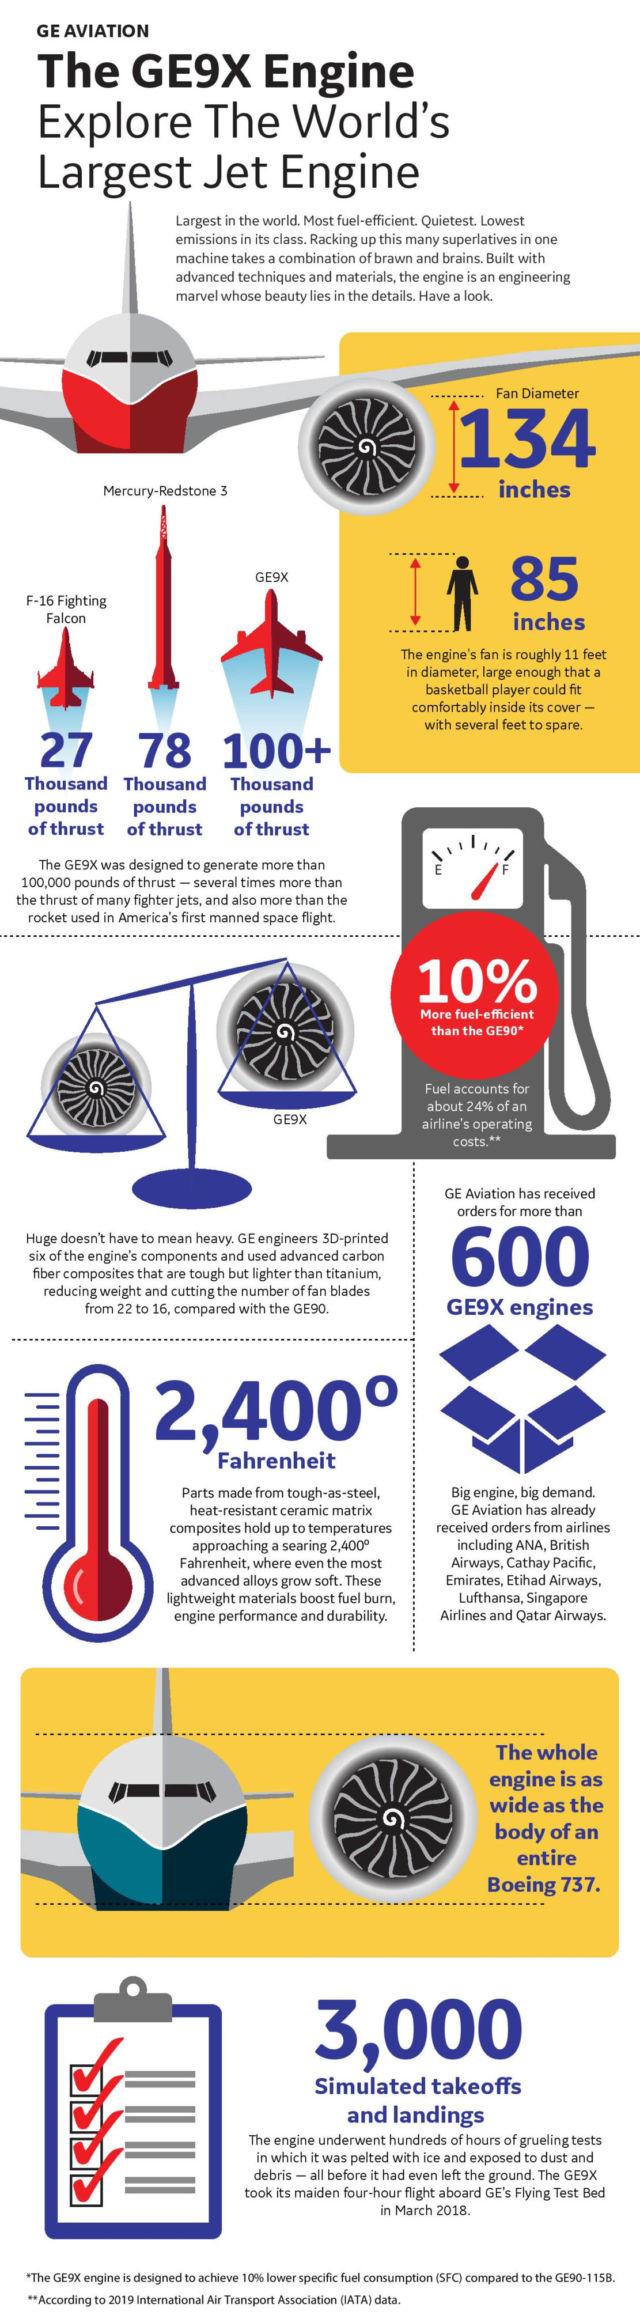 GE9X engine infographic